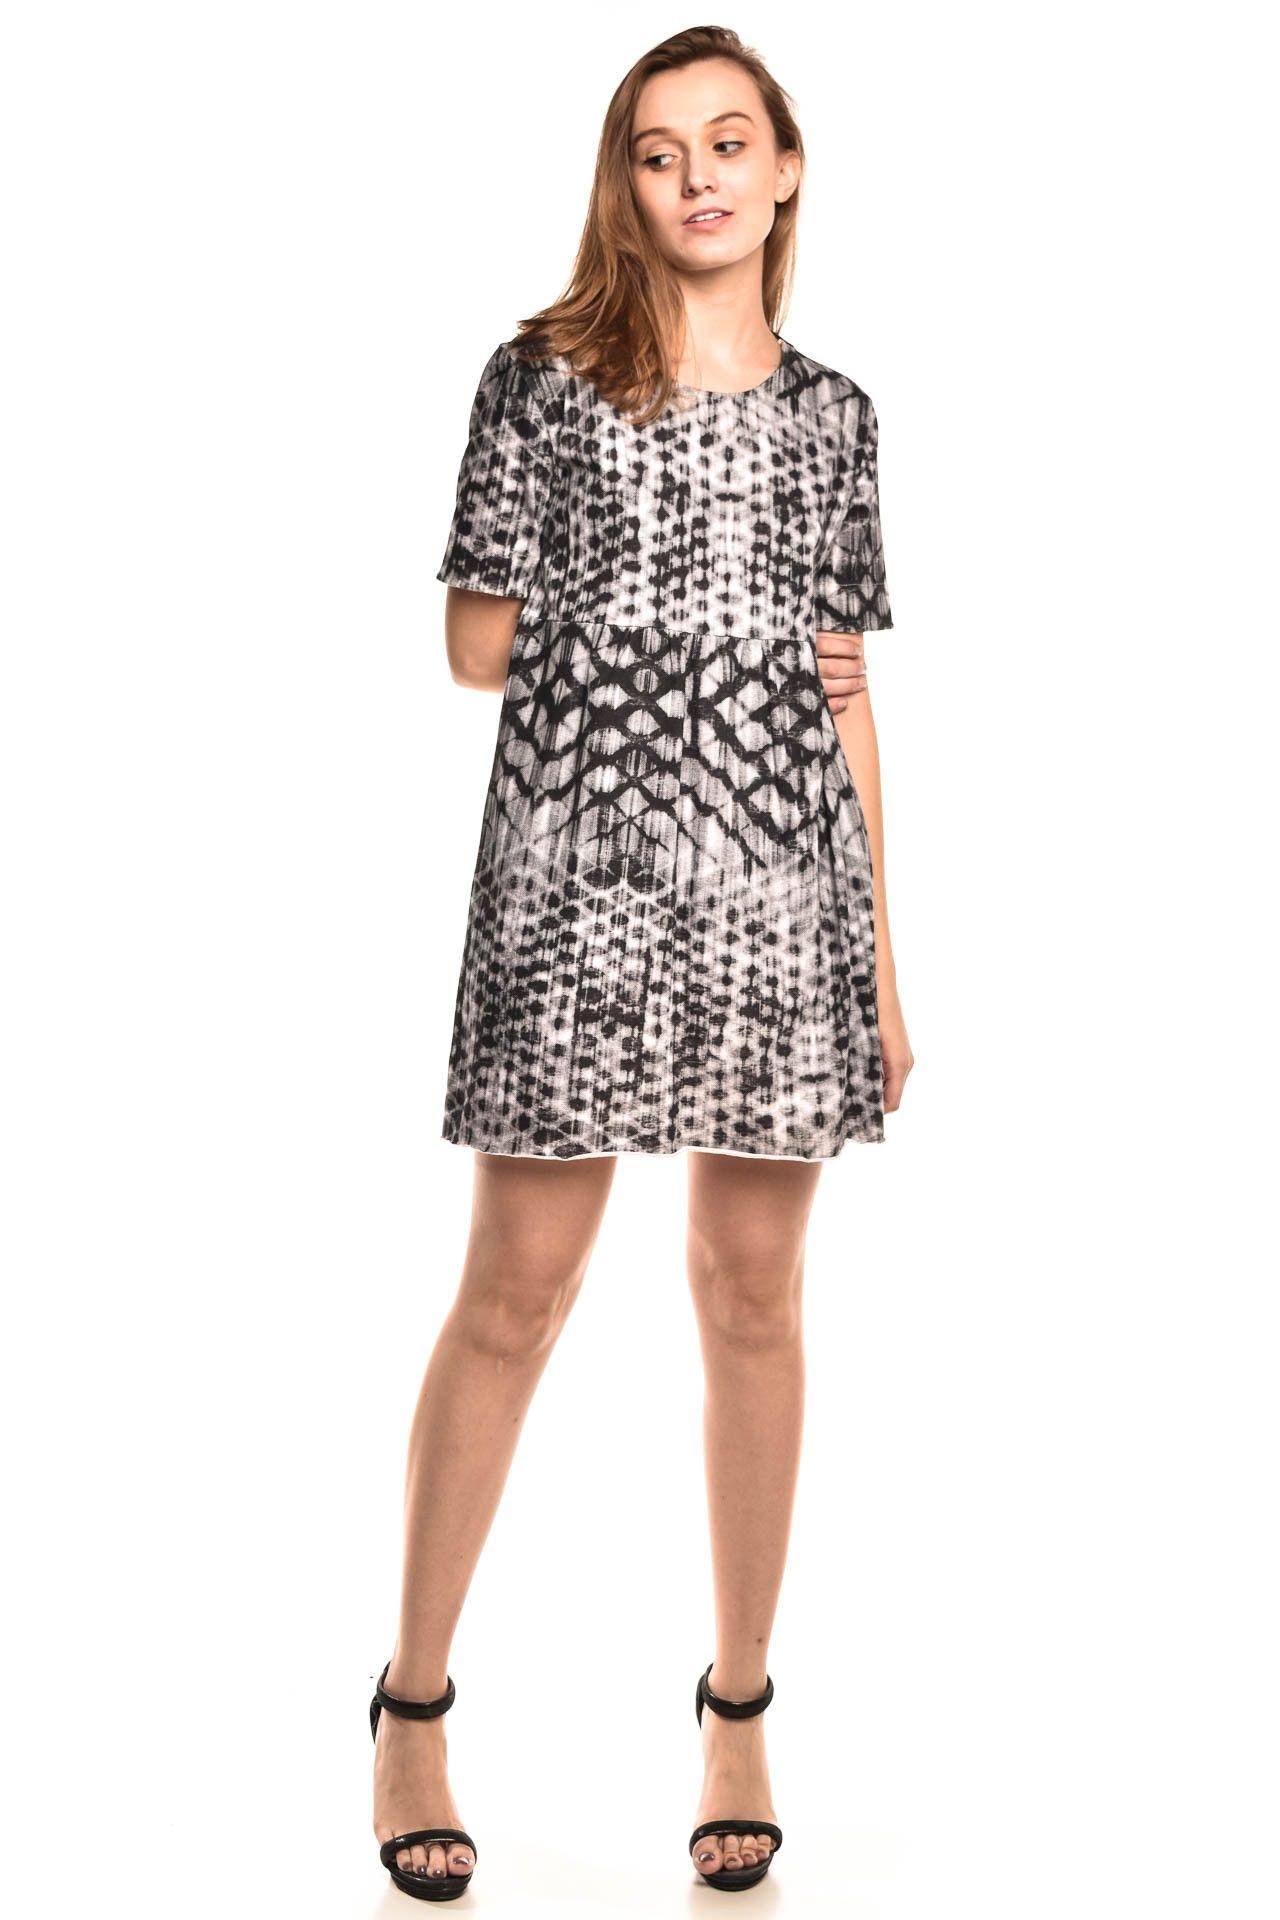 Osklen - Vestido Estampa Mescla - Foto 3